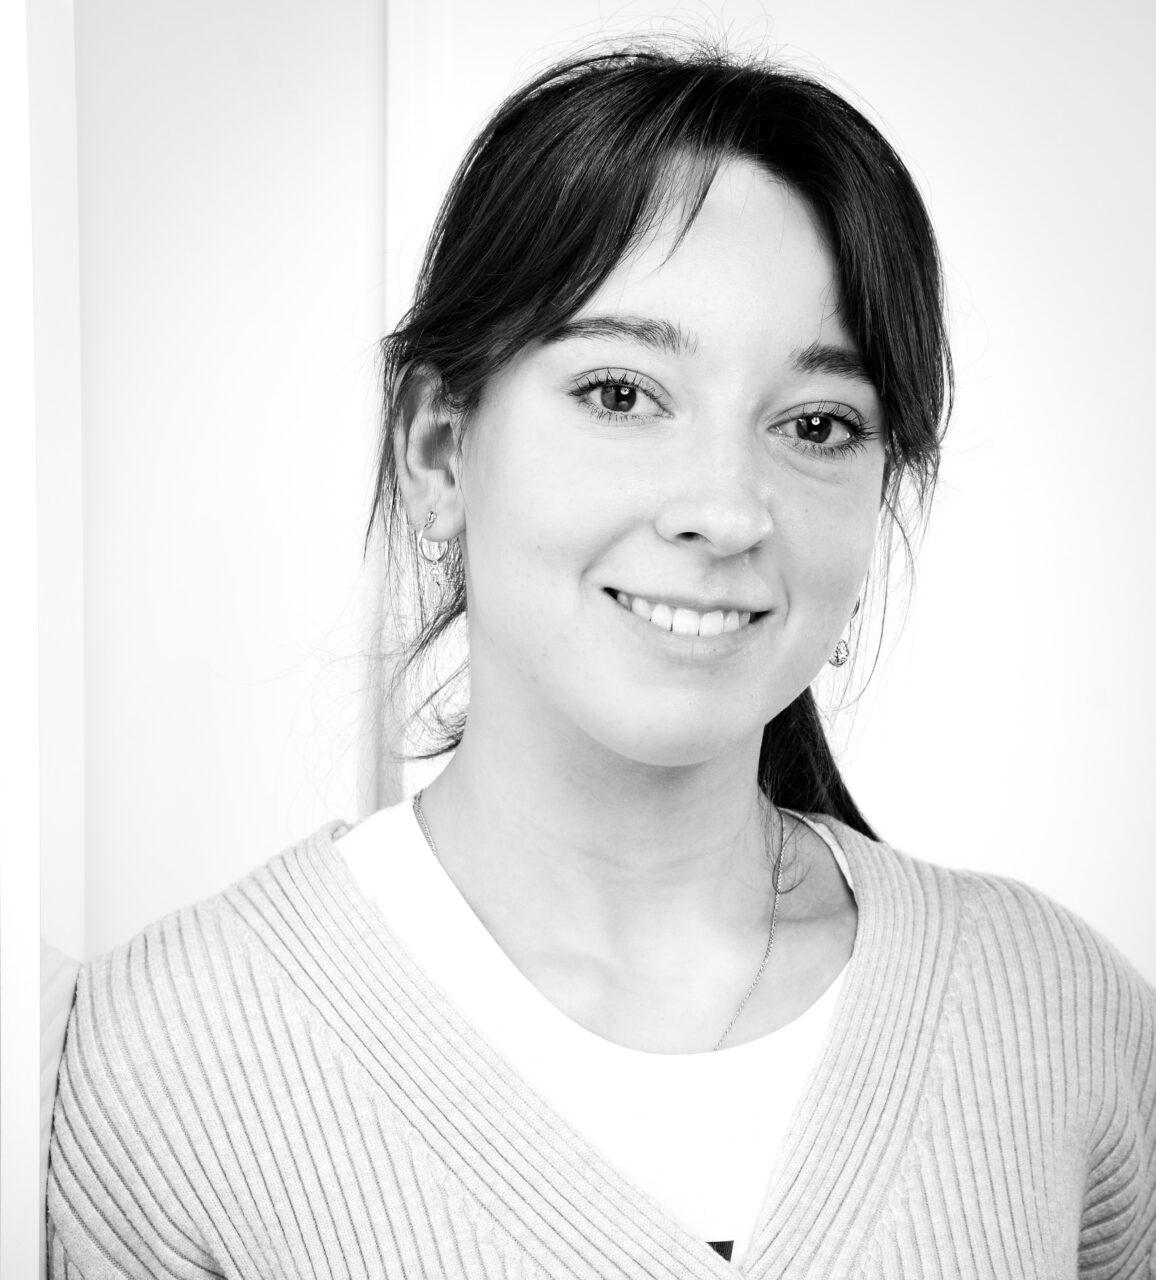 Elena Djacenko